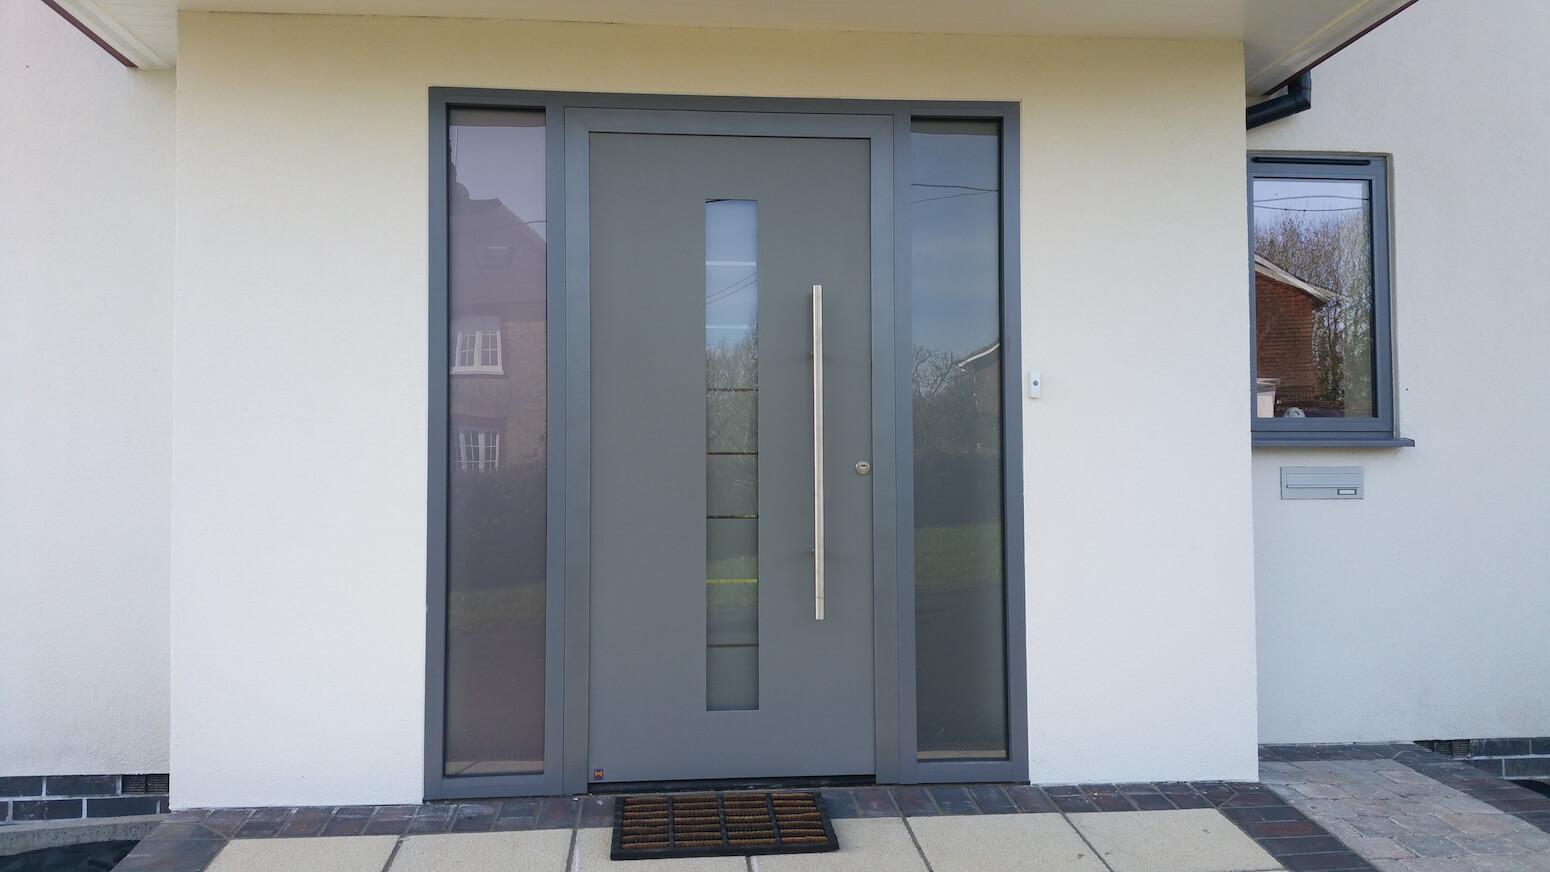 5 advantages of owning an aluminium front door  Interior